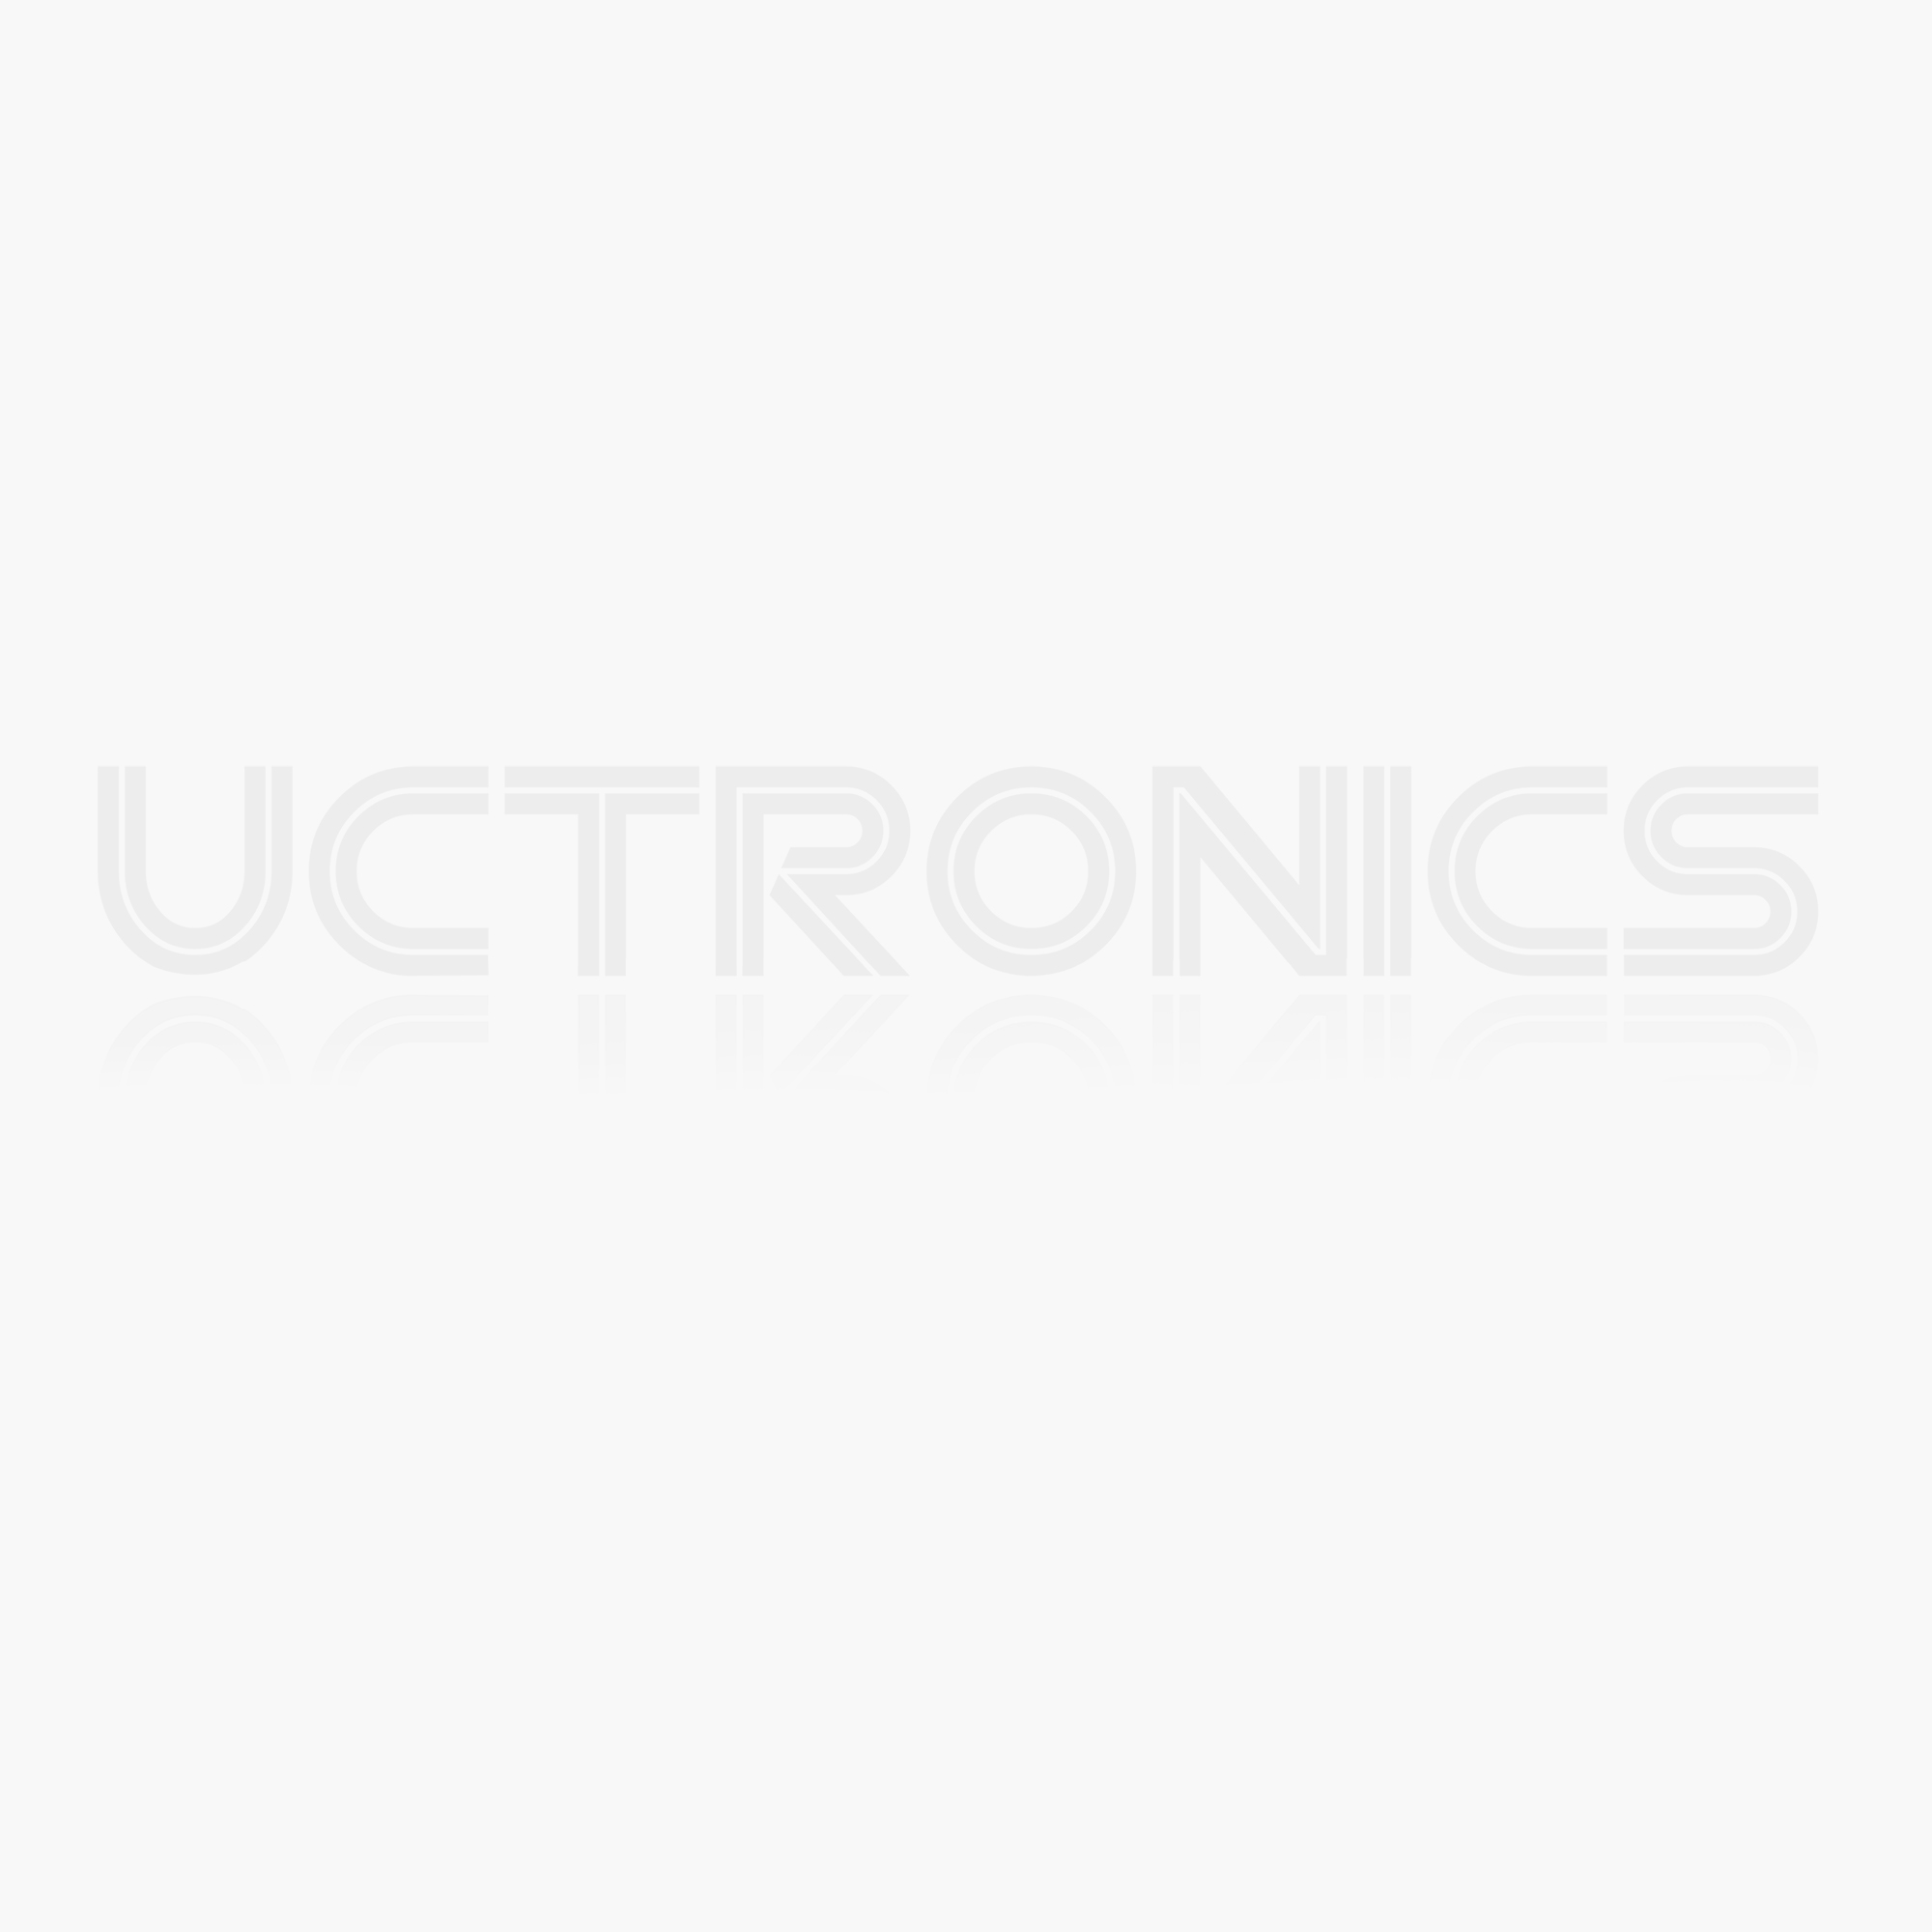 AC-DC 9V 500mA Step-down Buck Power Supply Converter Module